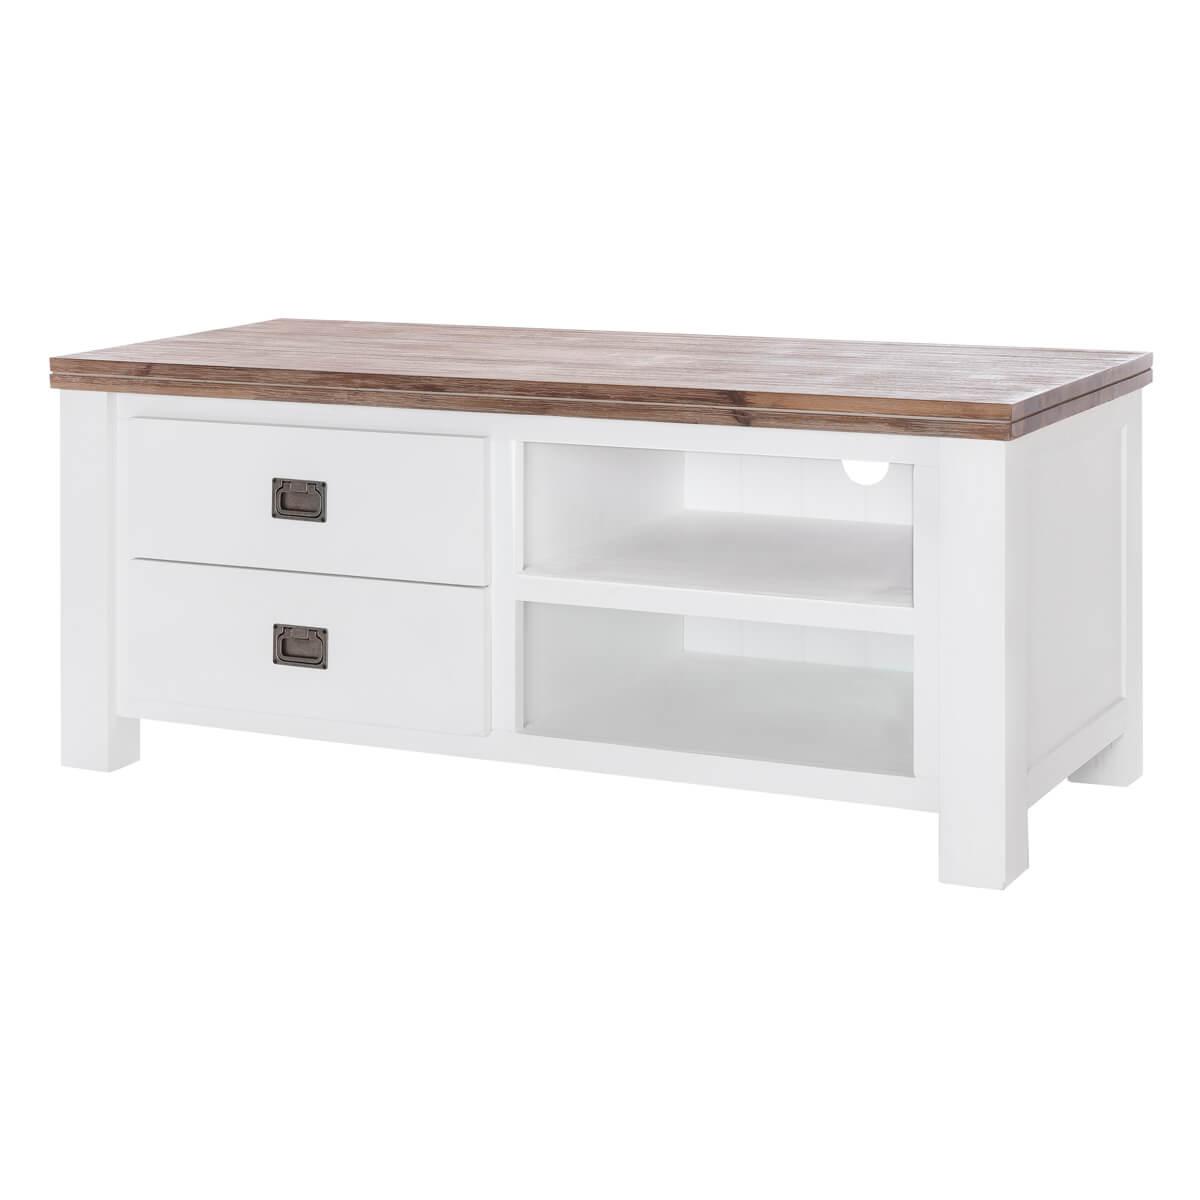 lowboard wei holz beautiful tv board unterteil lowboard lyron wei massivholz holz akazie massiv. Black Bedroom Furniture Sets. Home Design Ideas